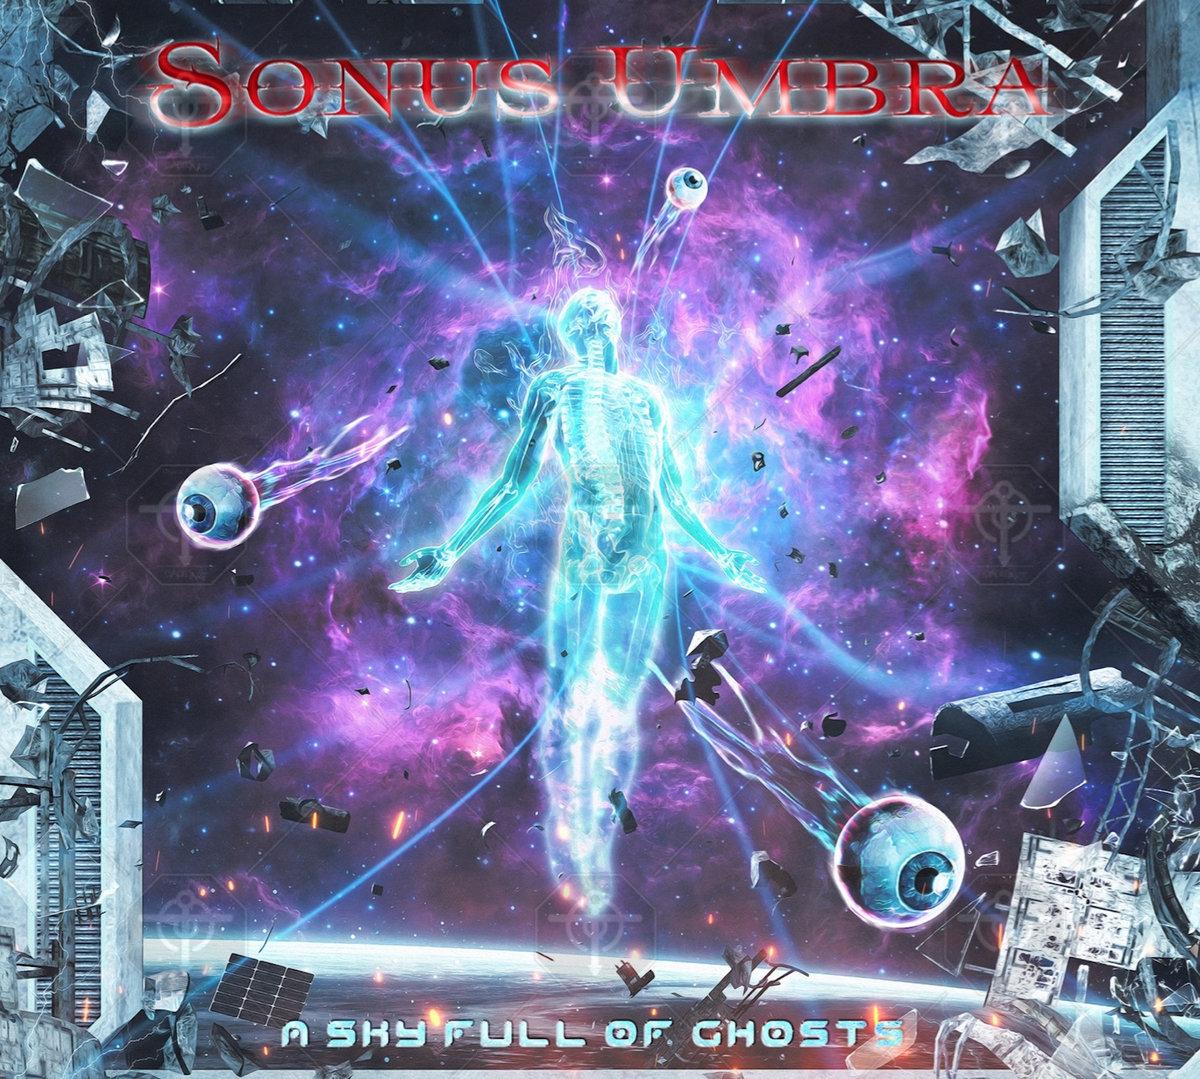 Sonus Umbra — A Sky Full of Ghosts